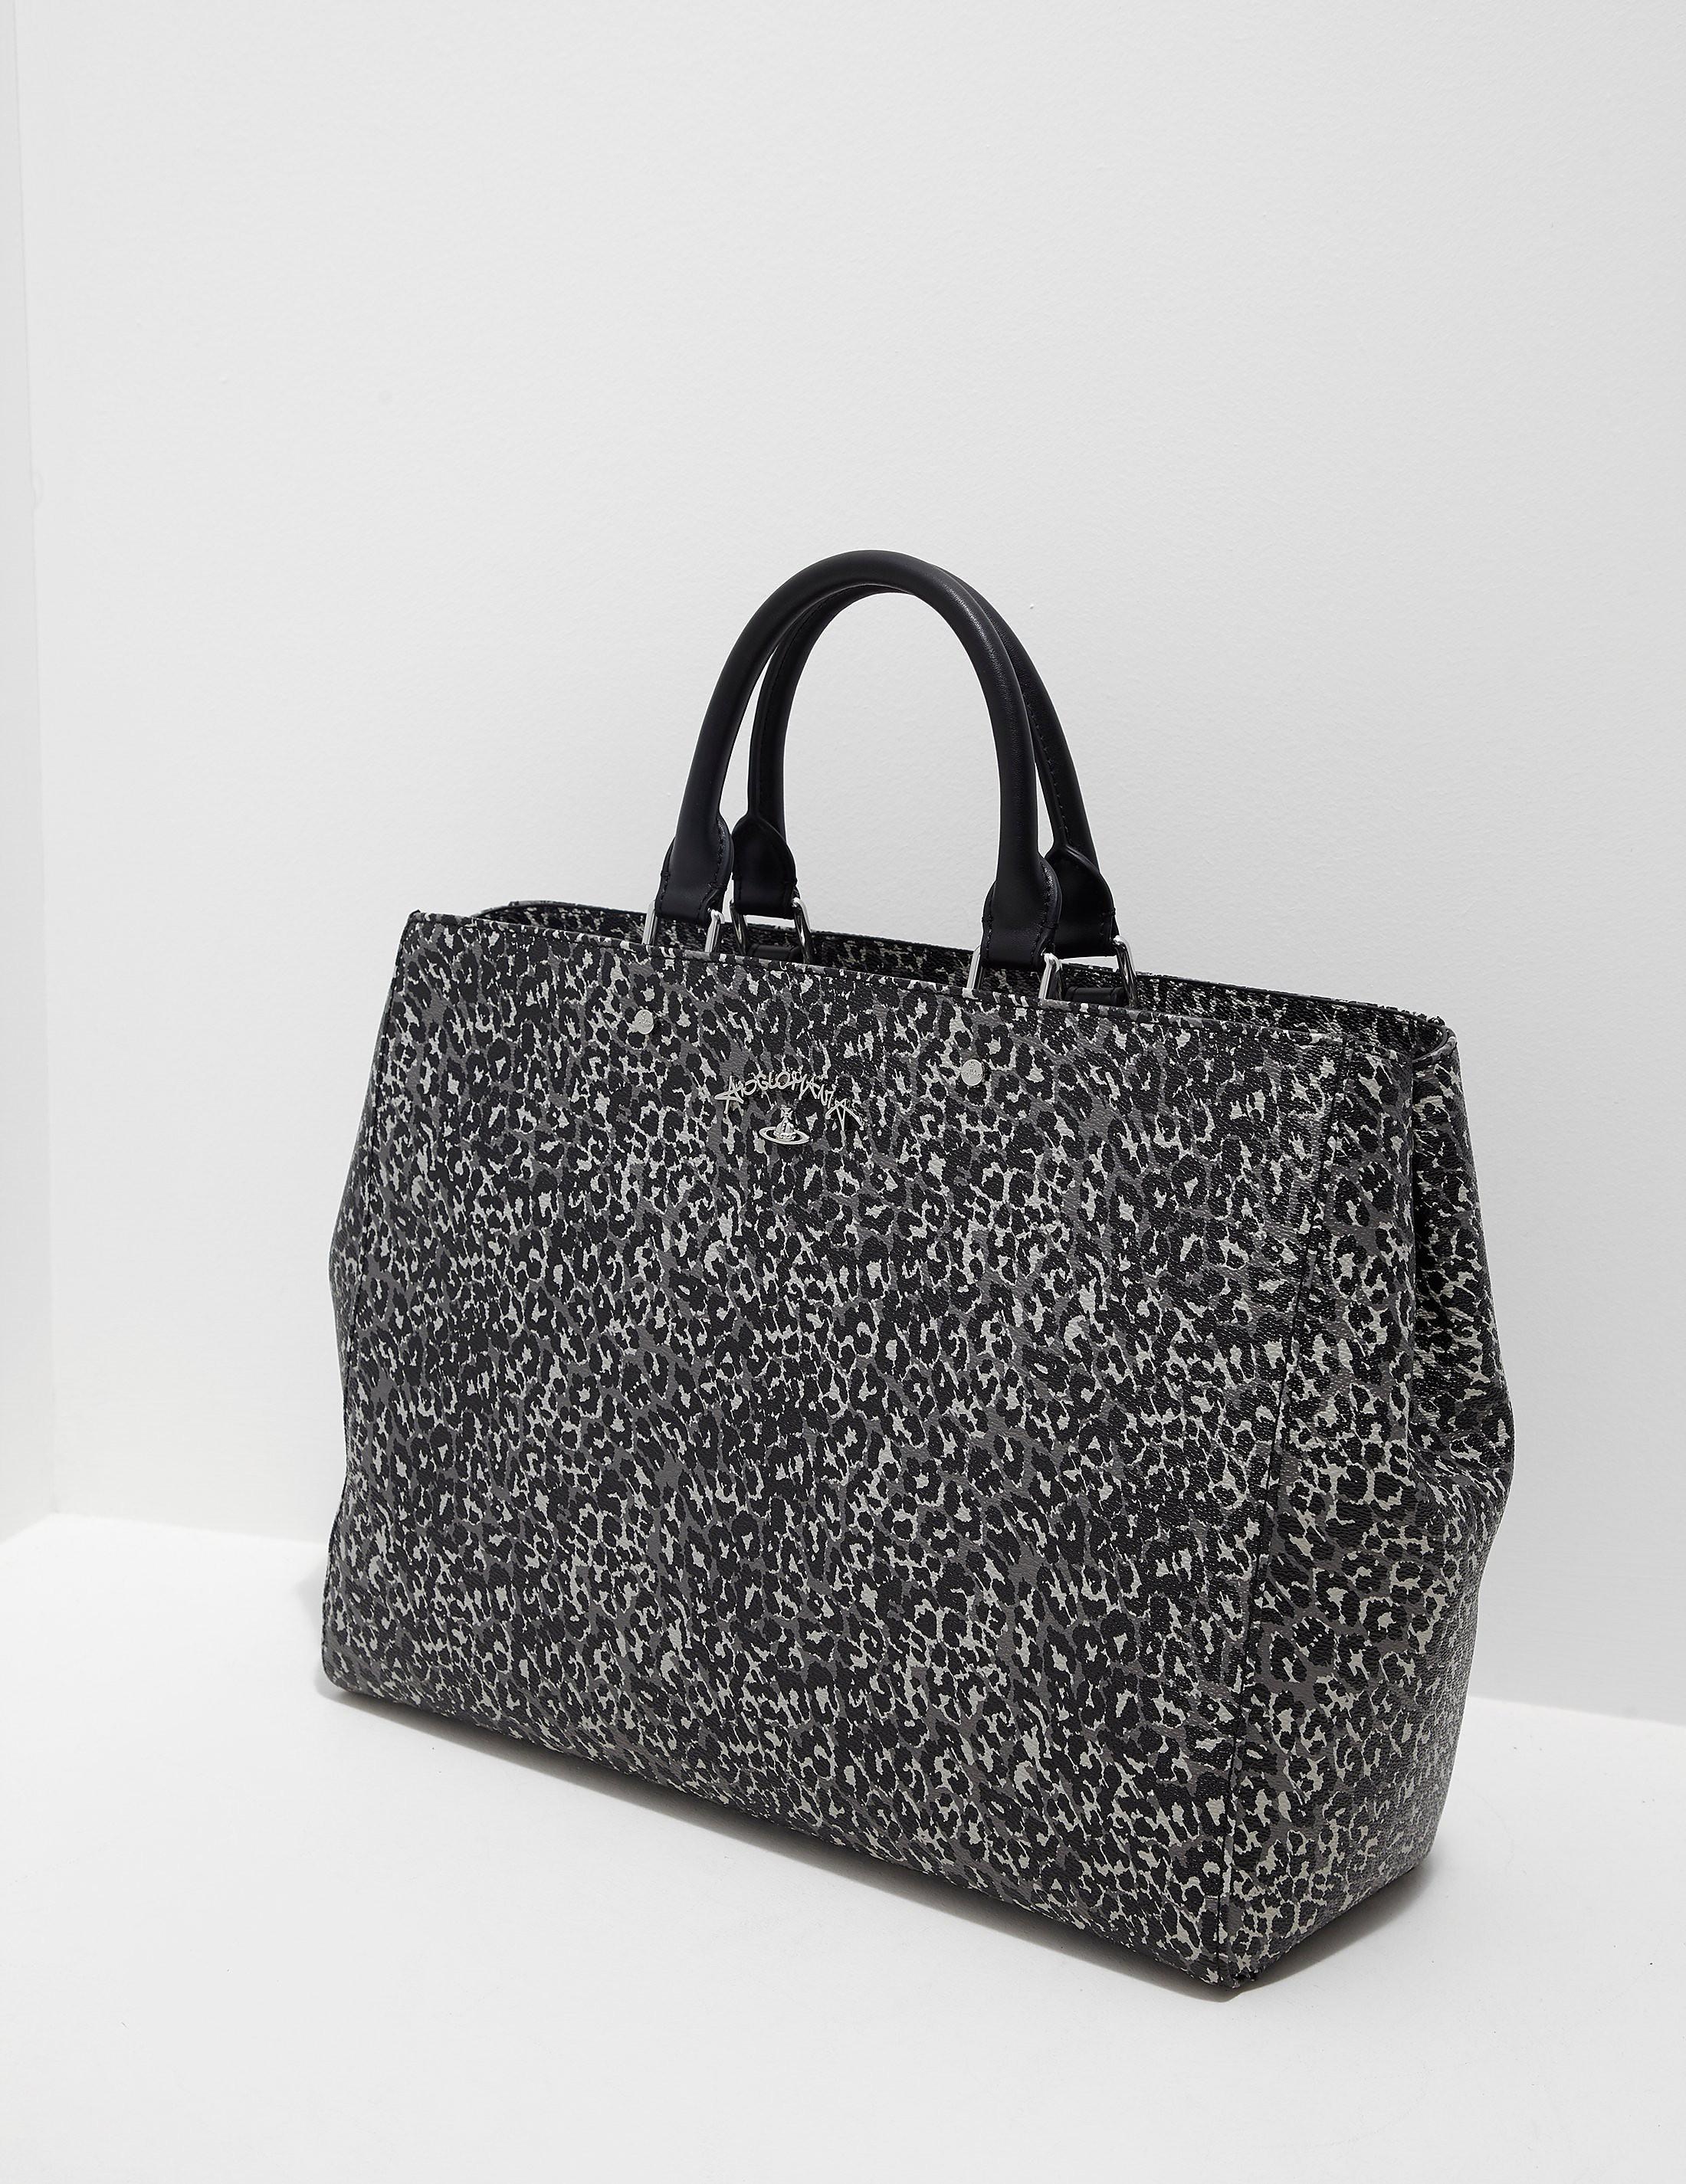 Vivienne Westwood Leopard Shopper Bag